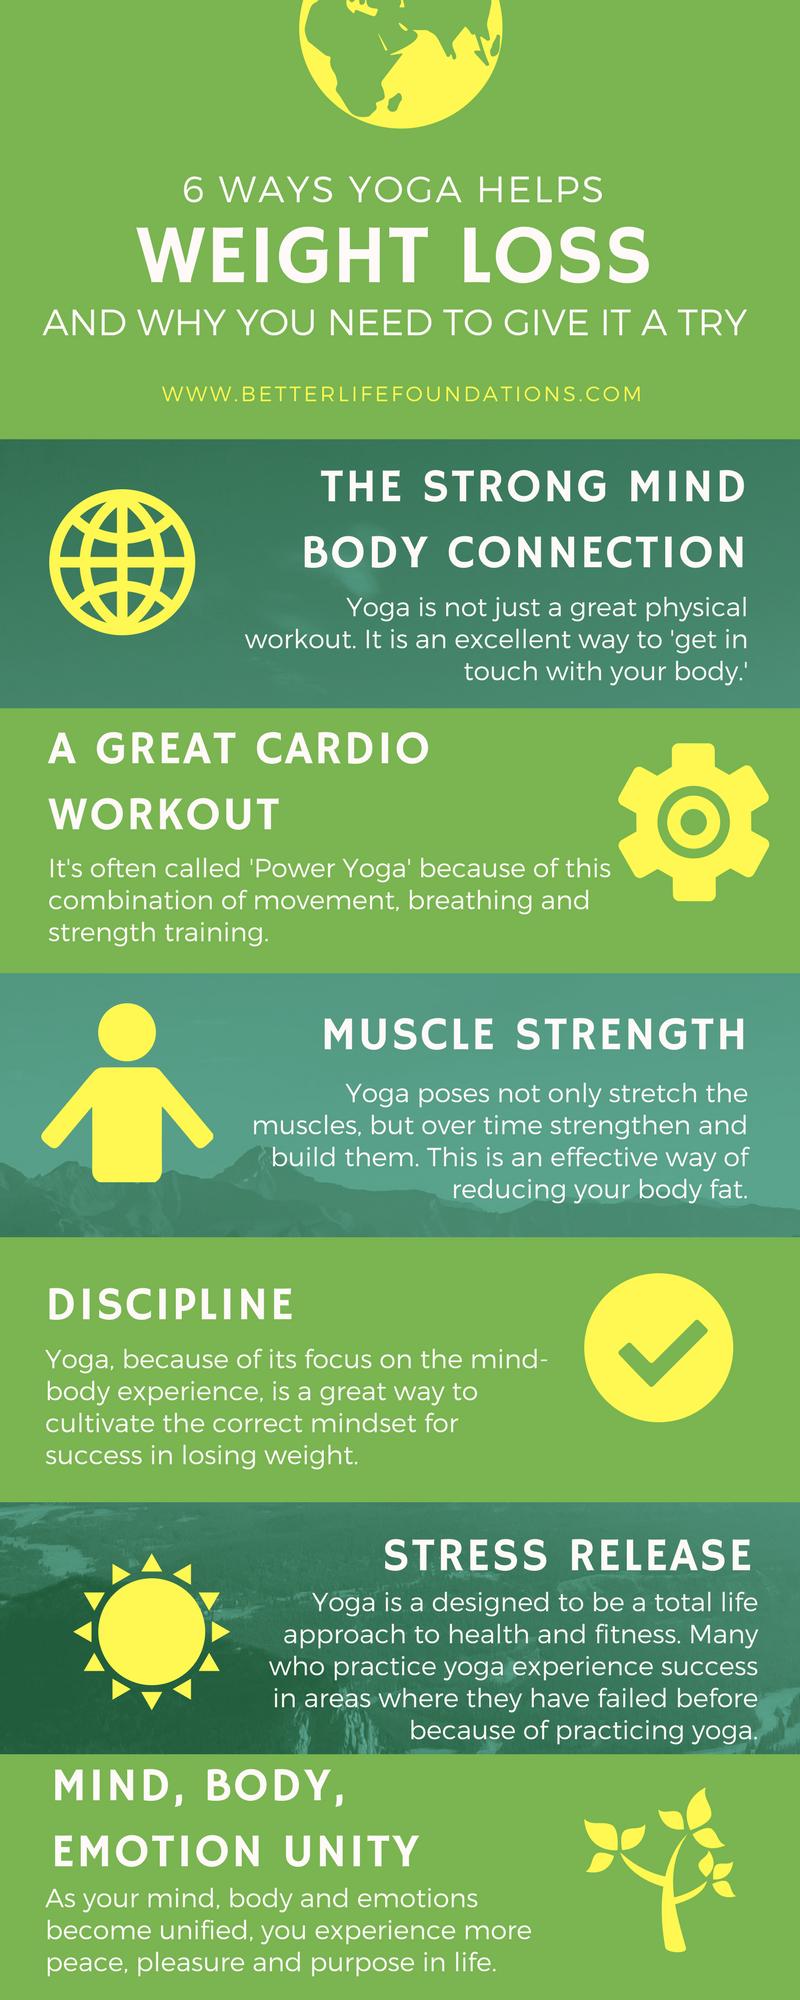 6 Ways Yoga Helps Weight Loss